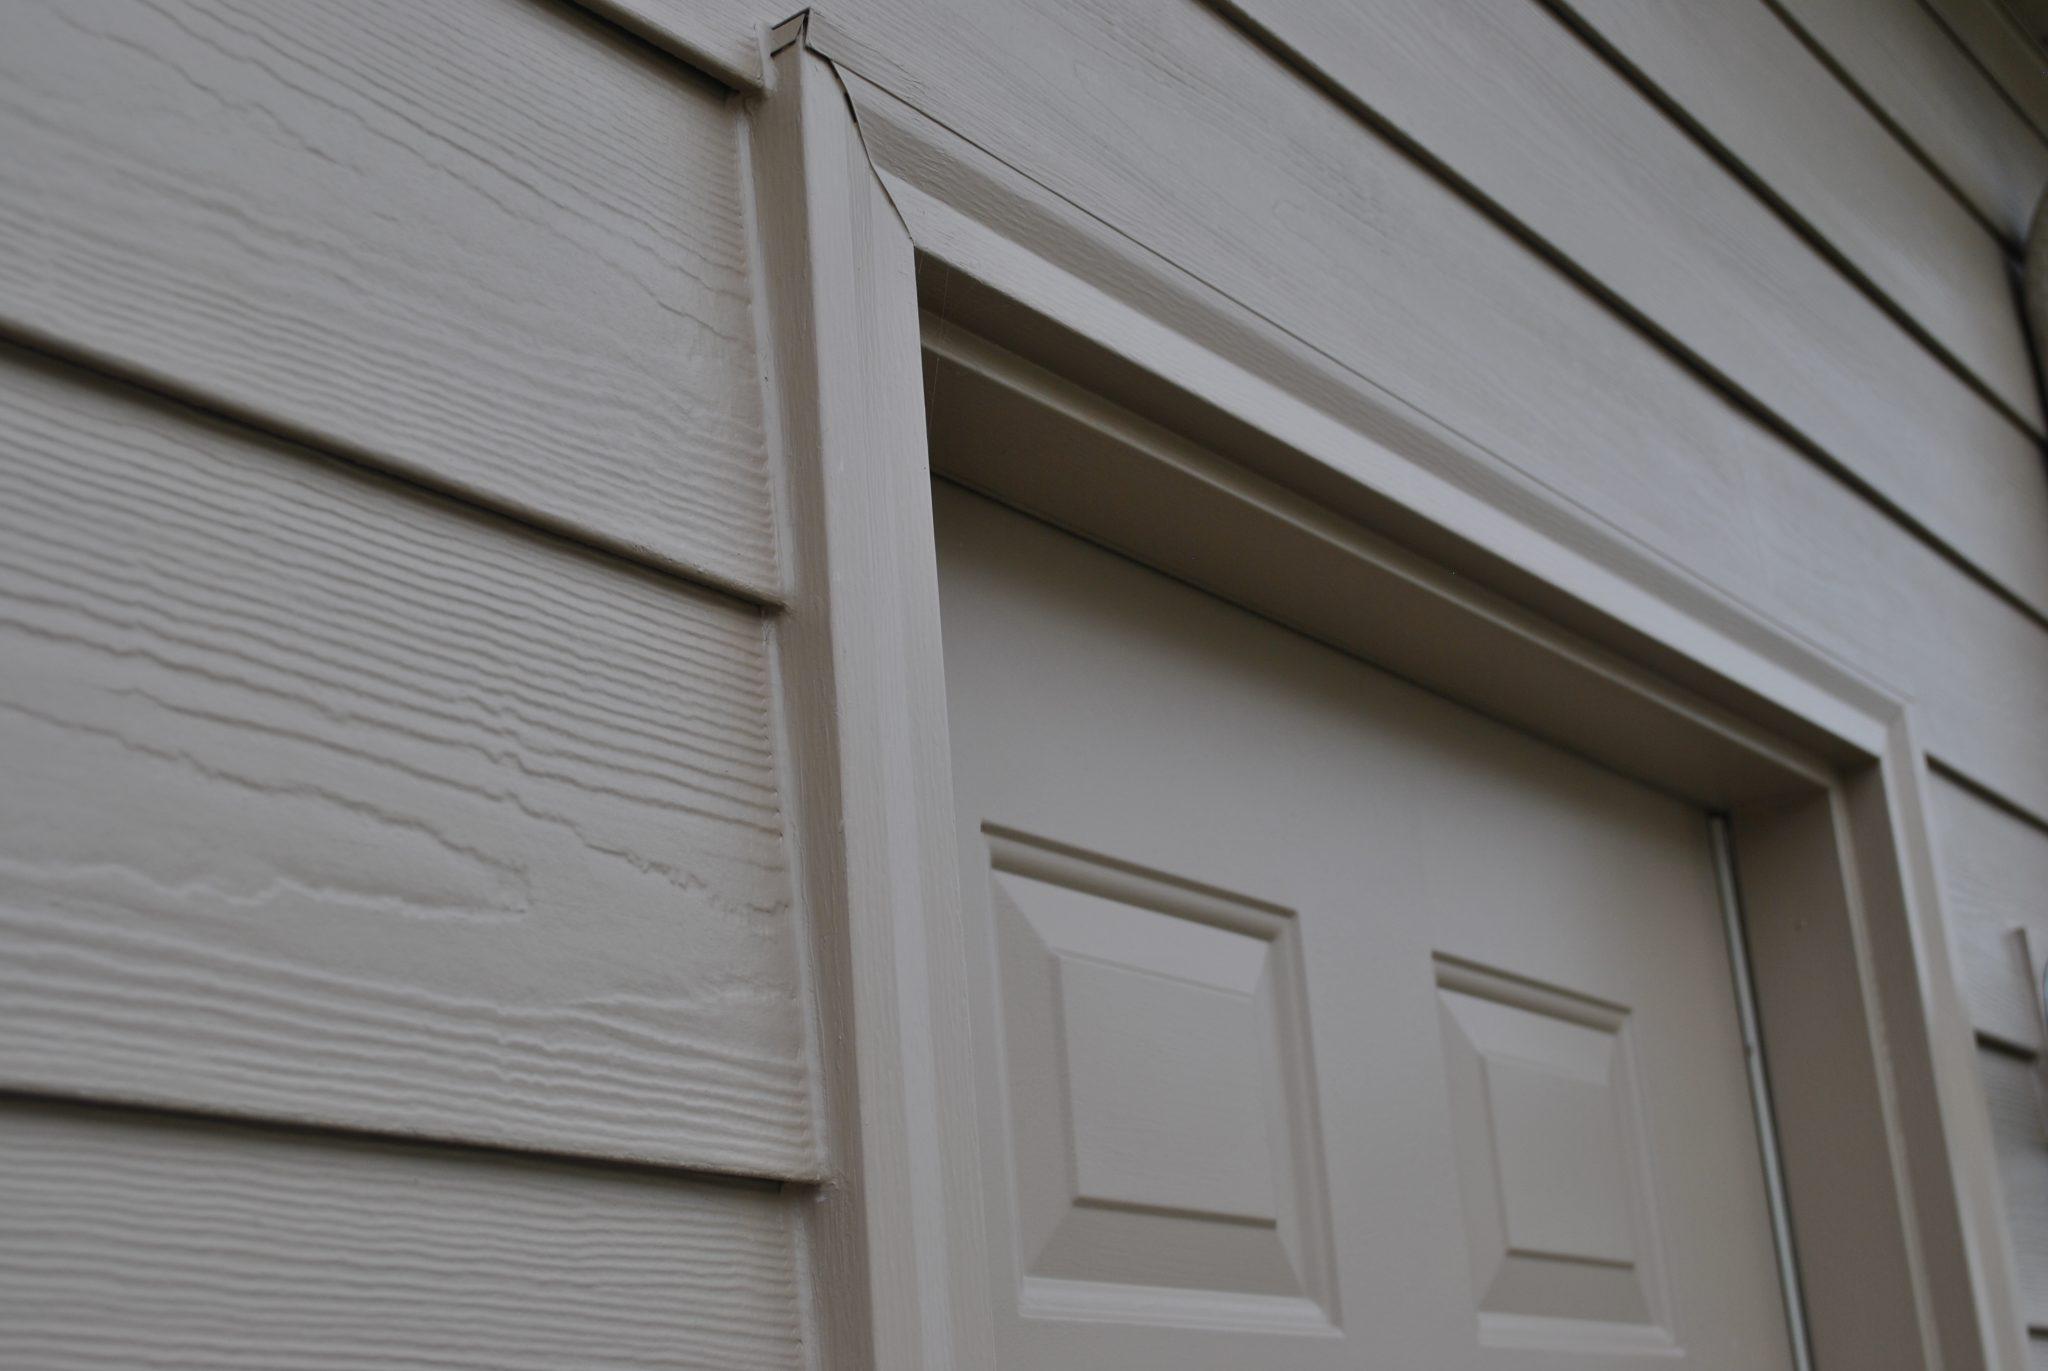 vinyl siding vs. fiber cement siding installed on this home in Lincoln